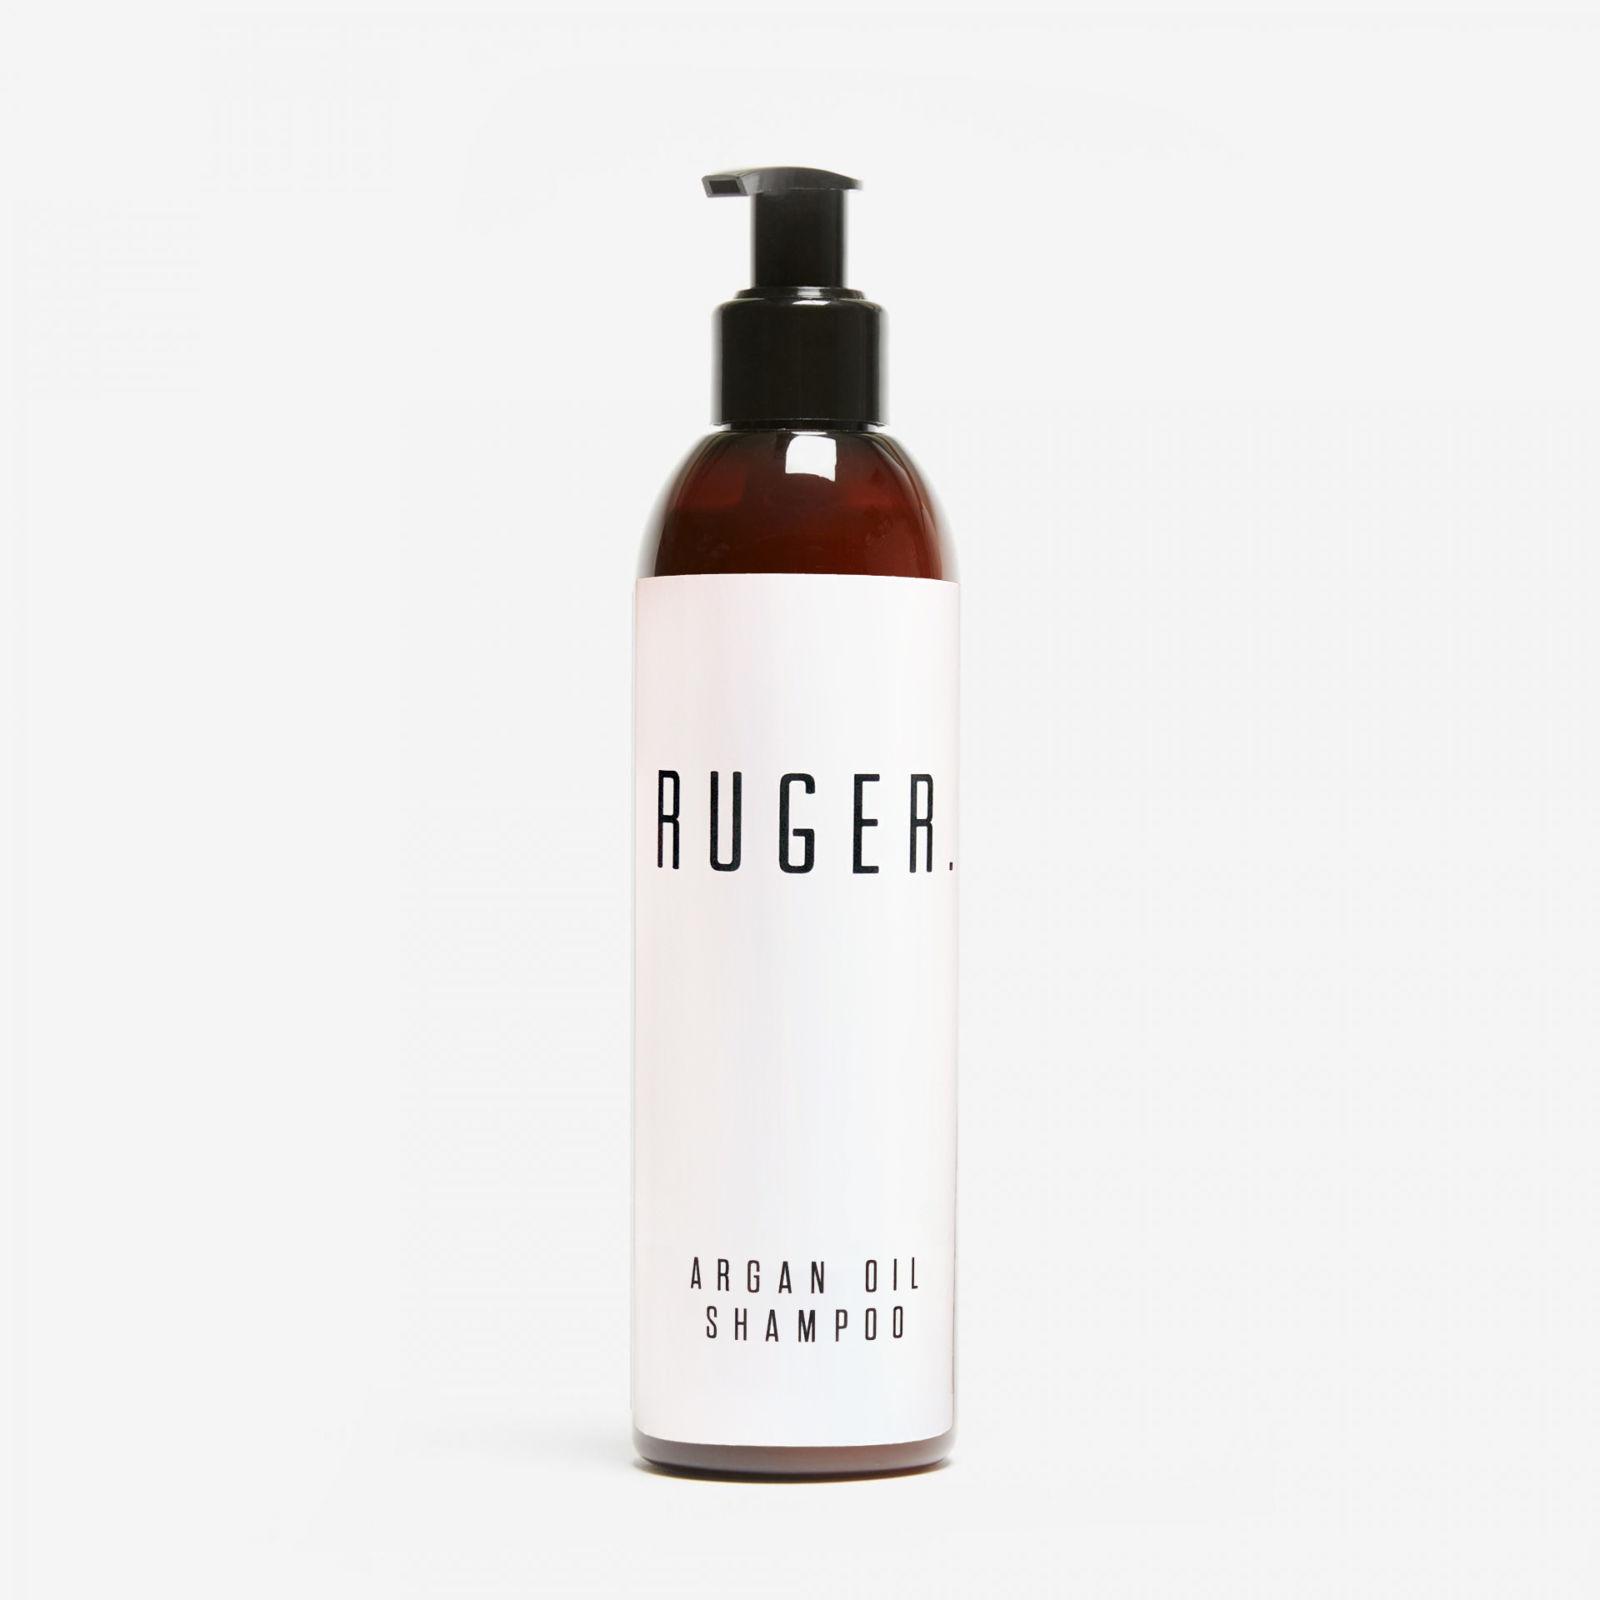 Tuotekuva: RUGER . Argan Oil Shampoo (250ml)